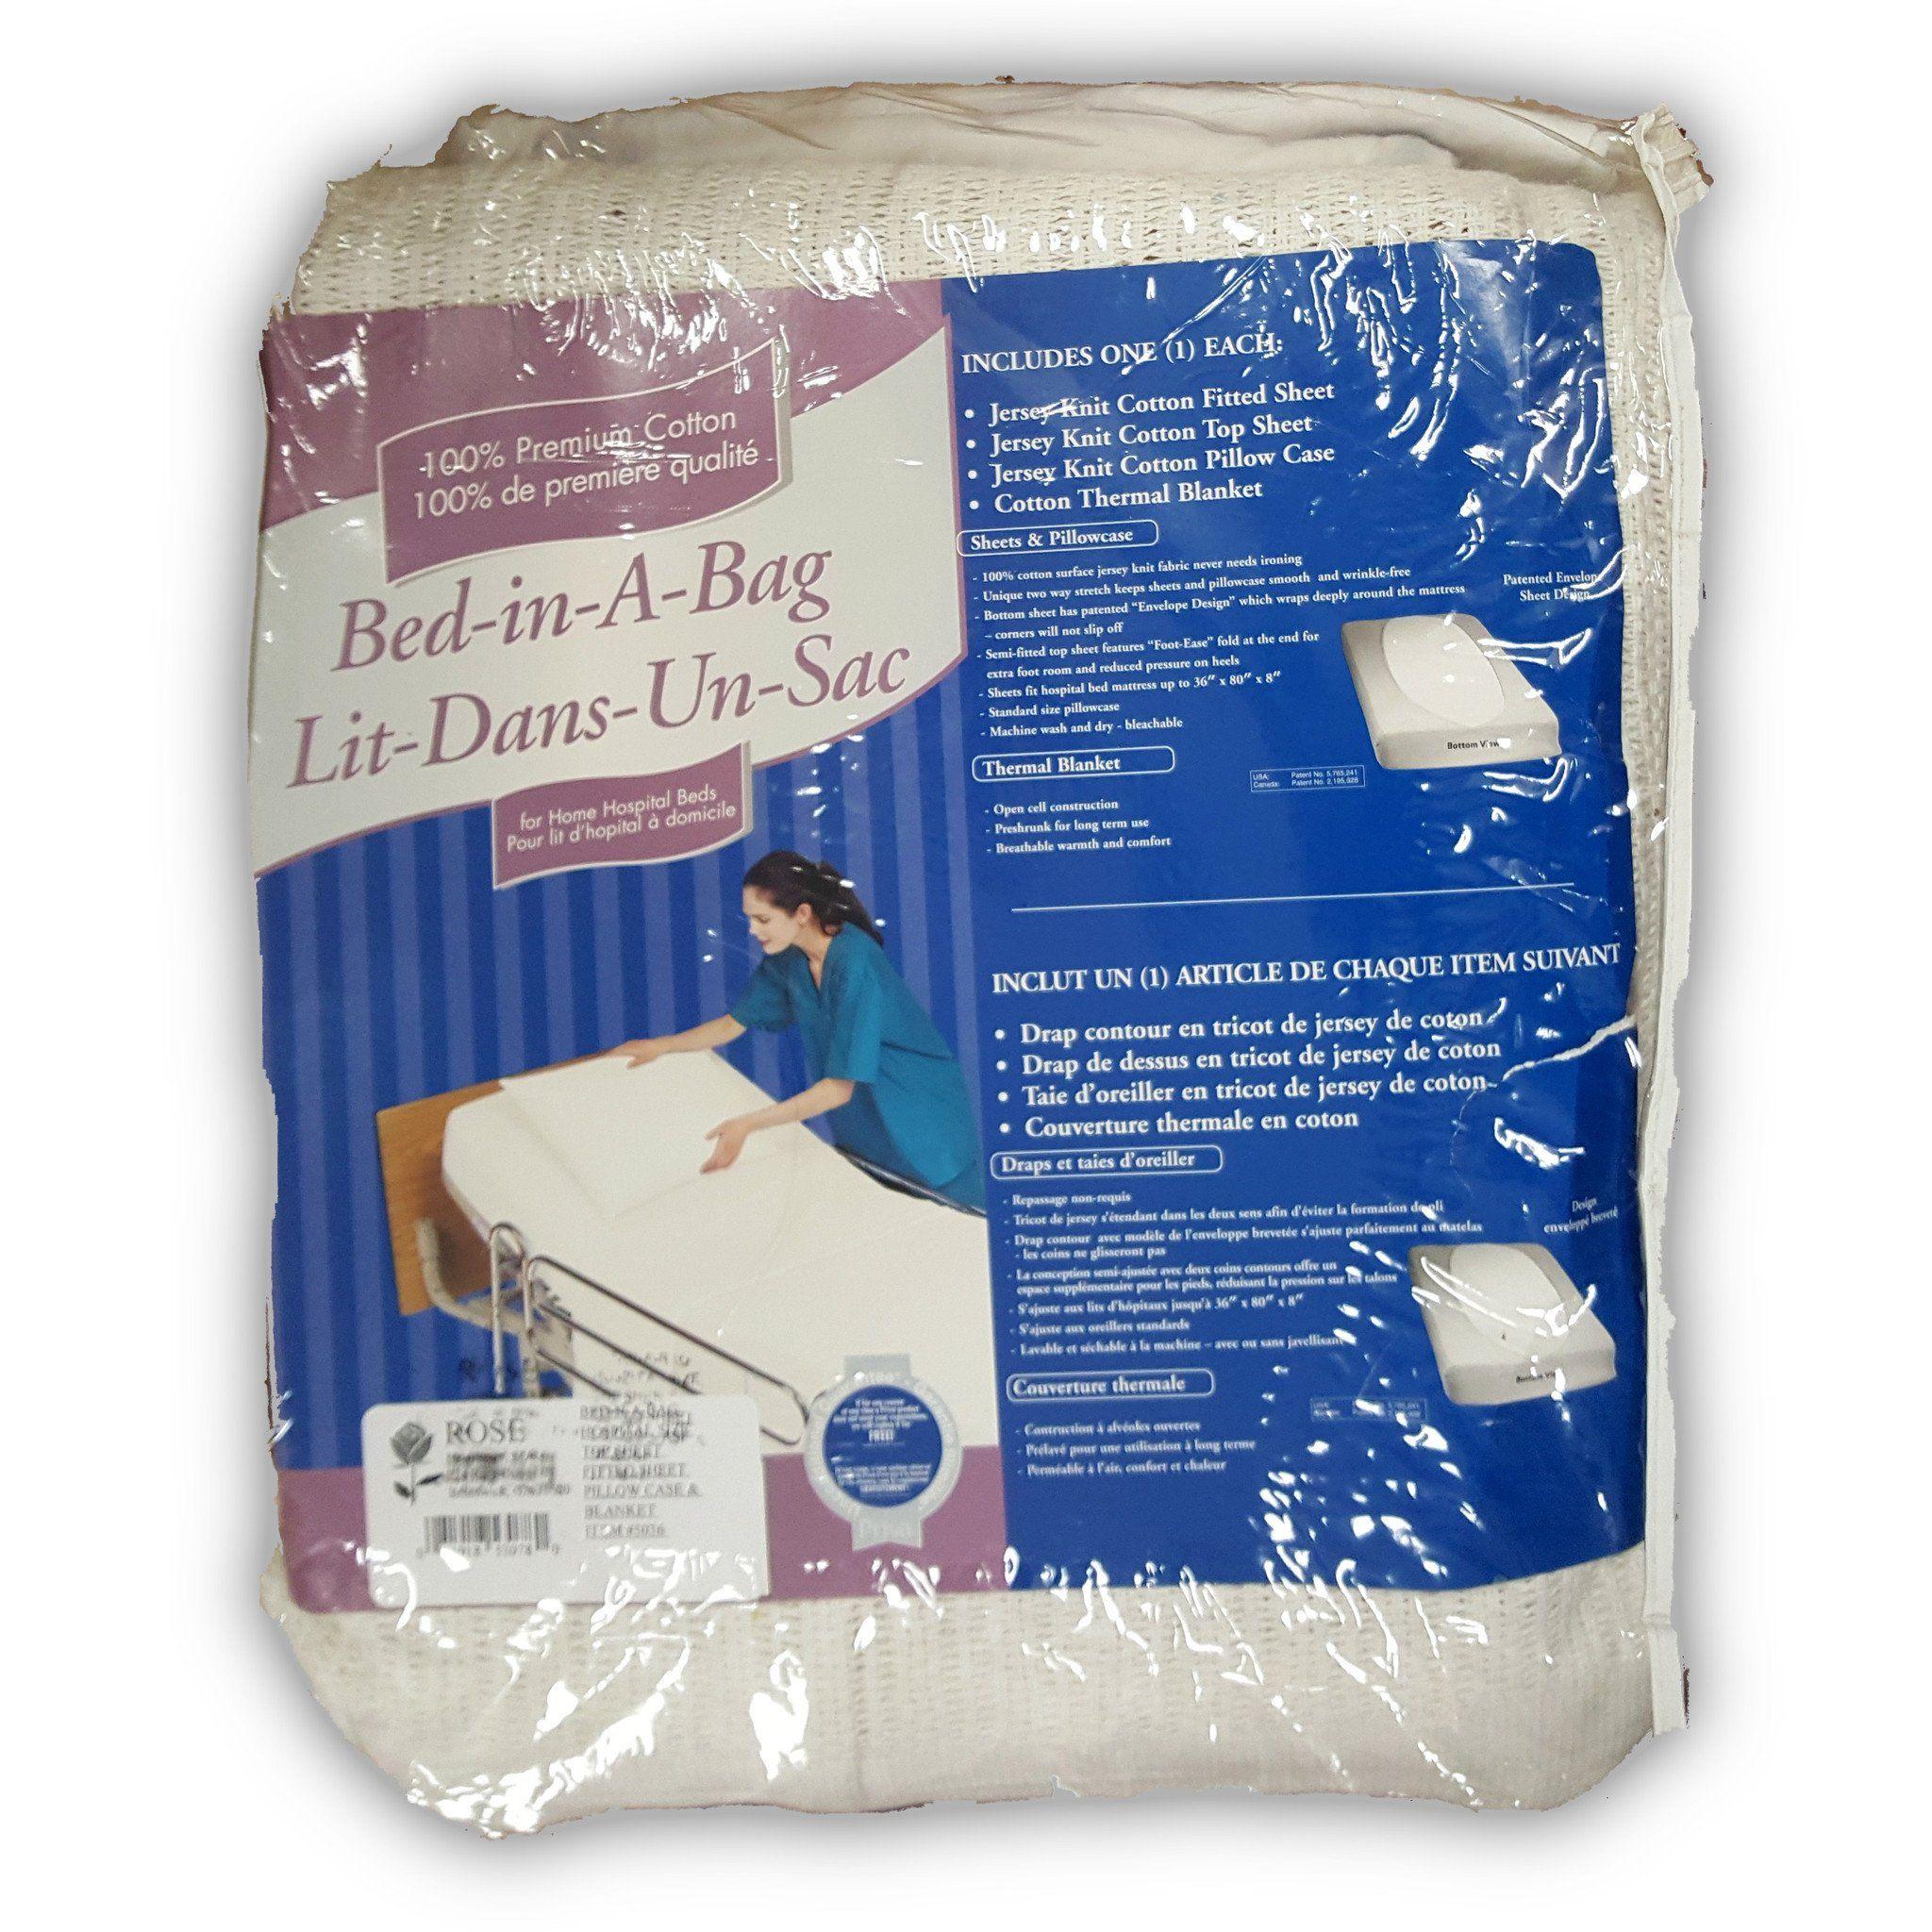 Cotton Bed In A Bag Blanket Sheet Kit For Home Hospital Beds | Rose  Healthcare #medical #medicalsupplies #pro2medical #health #healthcare  #lifestyle ...